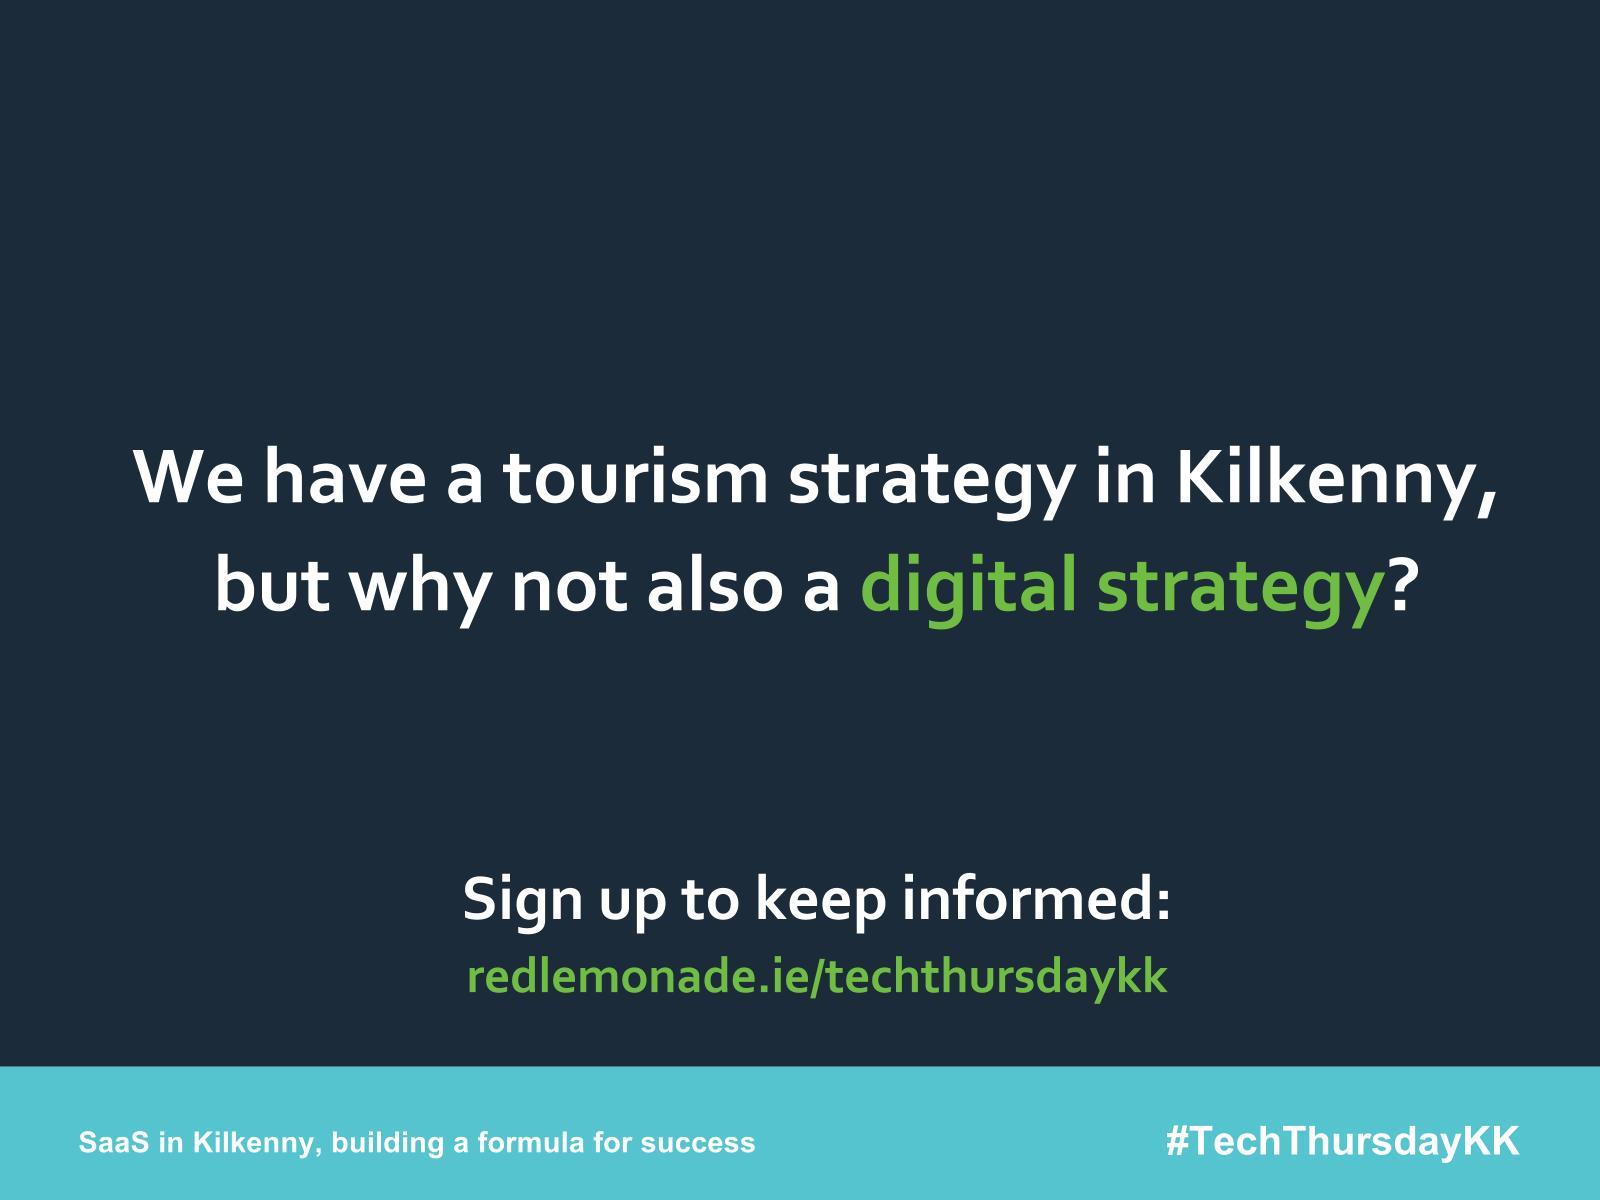 digital strategy, Kilkenny